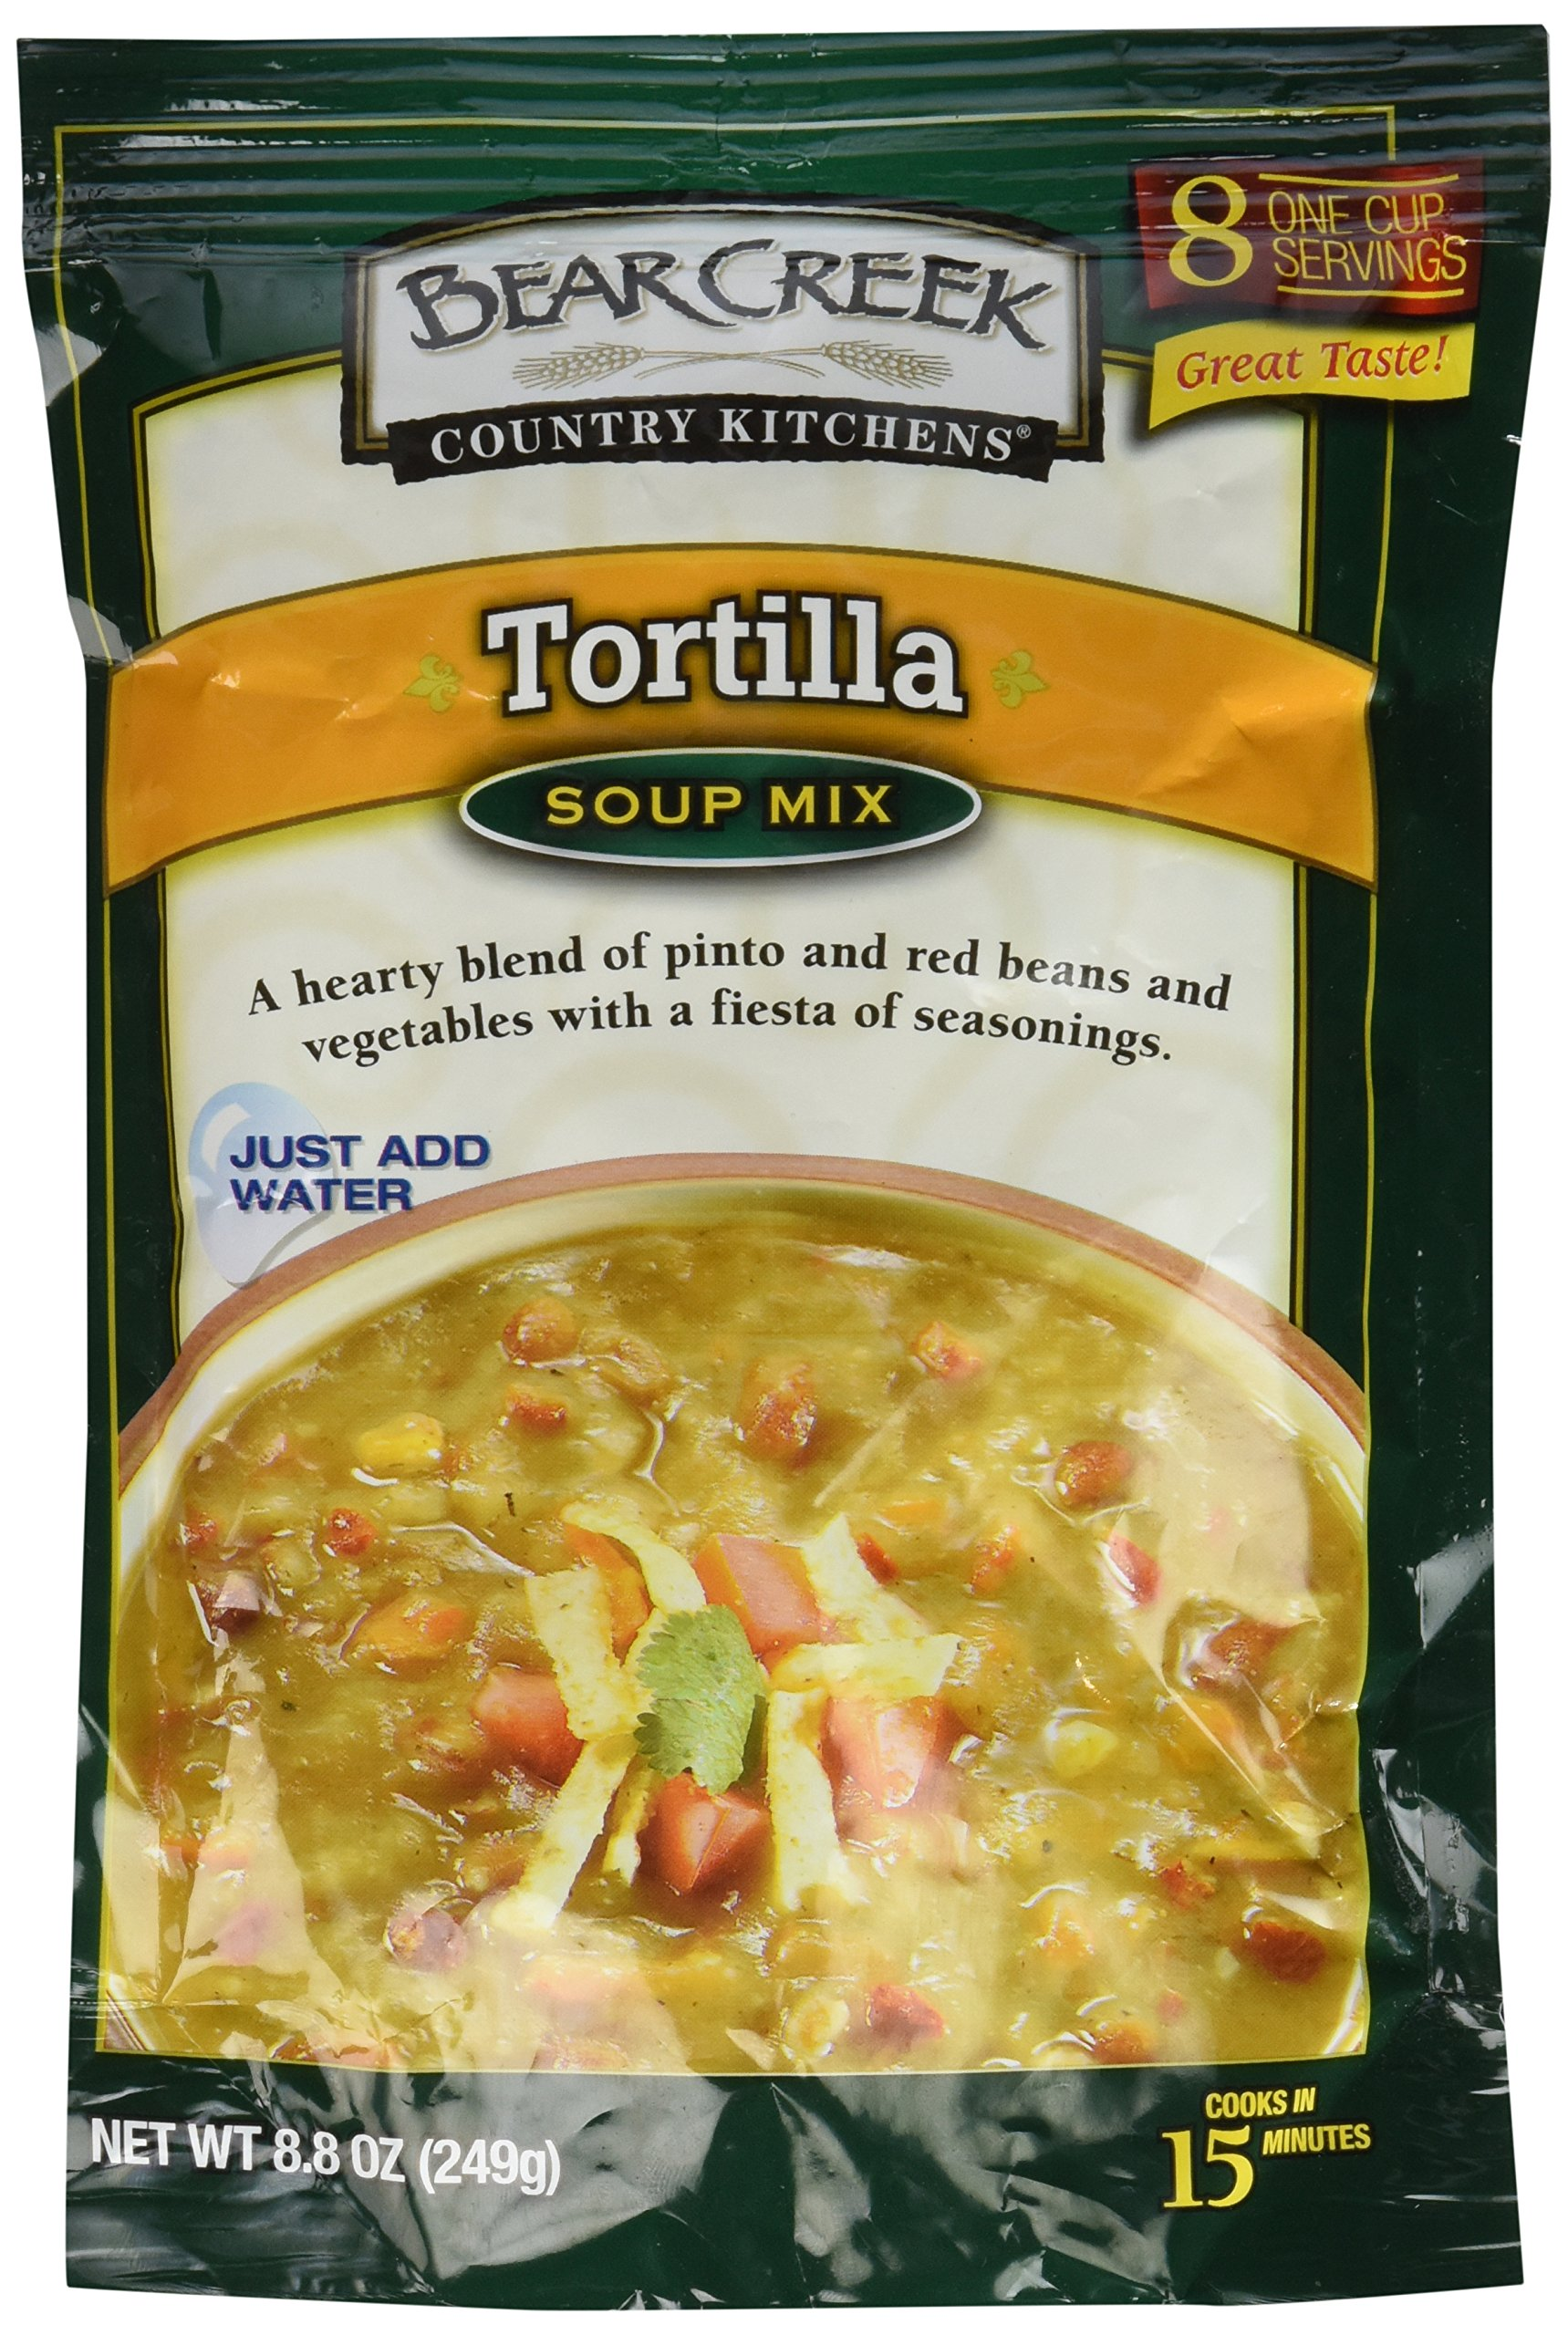 Bear Creek TORTILLA Soup Mix 8.8oz (3 Pack)